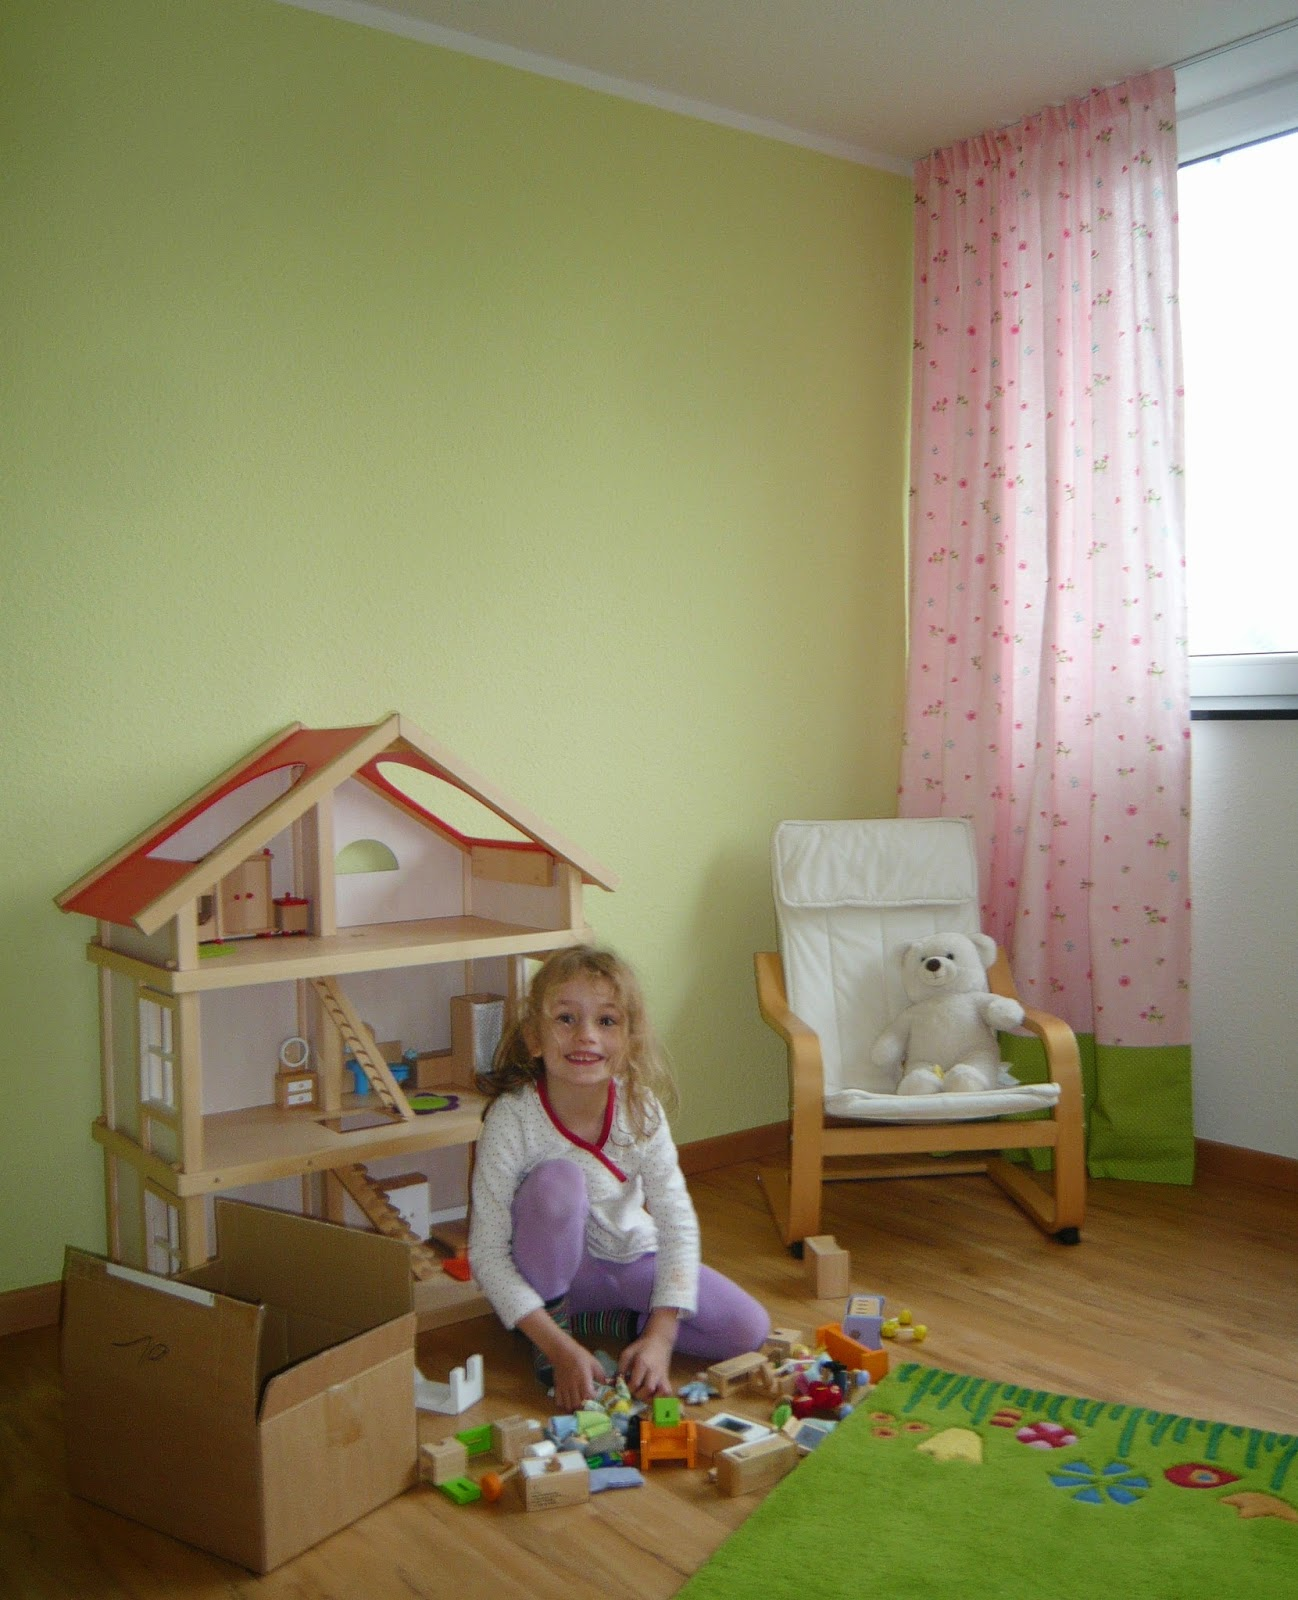 kleines ich by eva und vorh nge f rs kinderzimmer. Black Bedroom Furniture Sets. Home Design Ideas